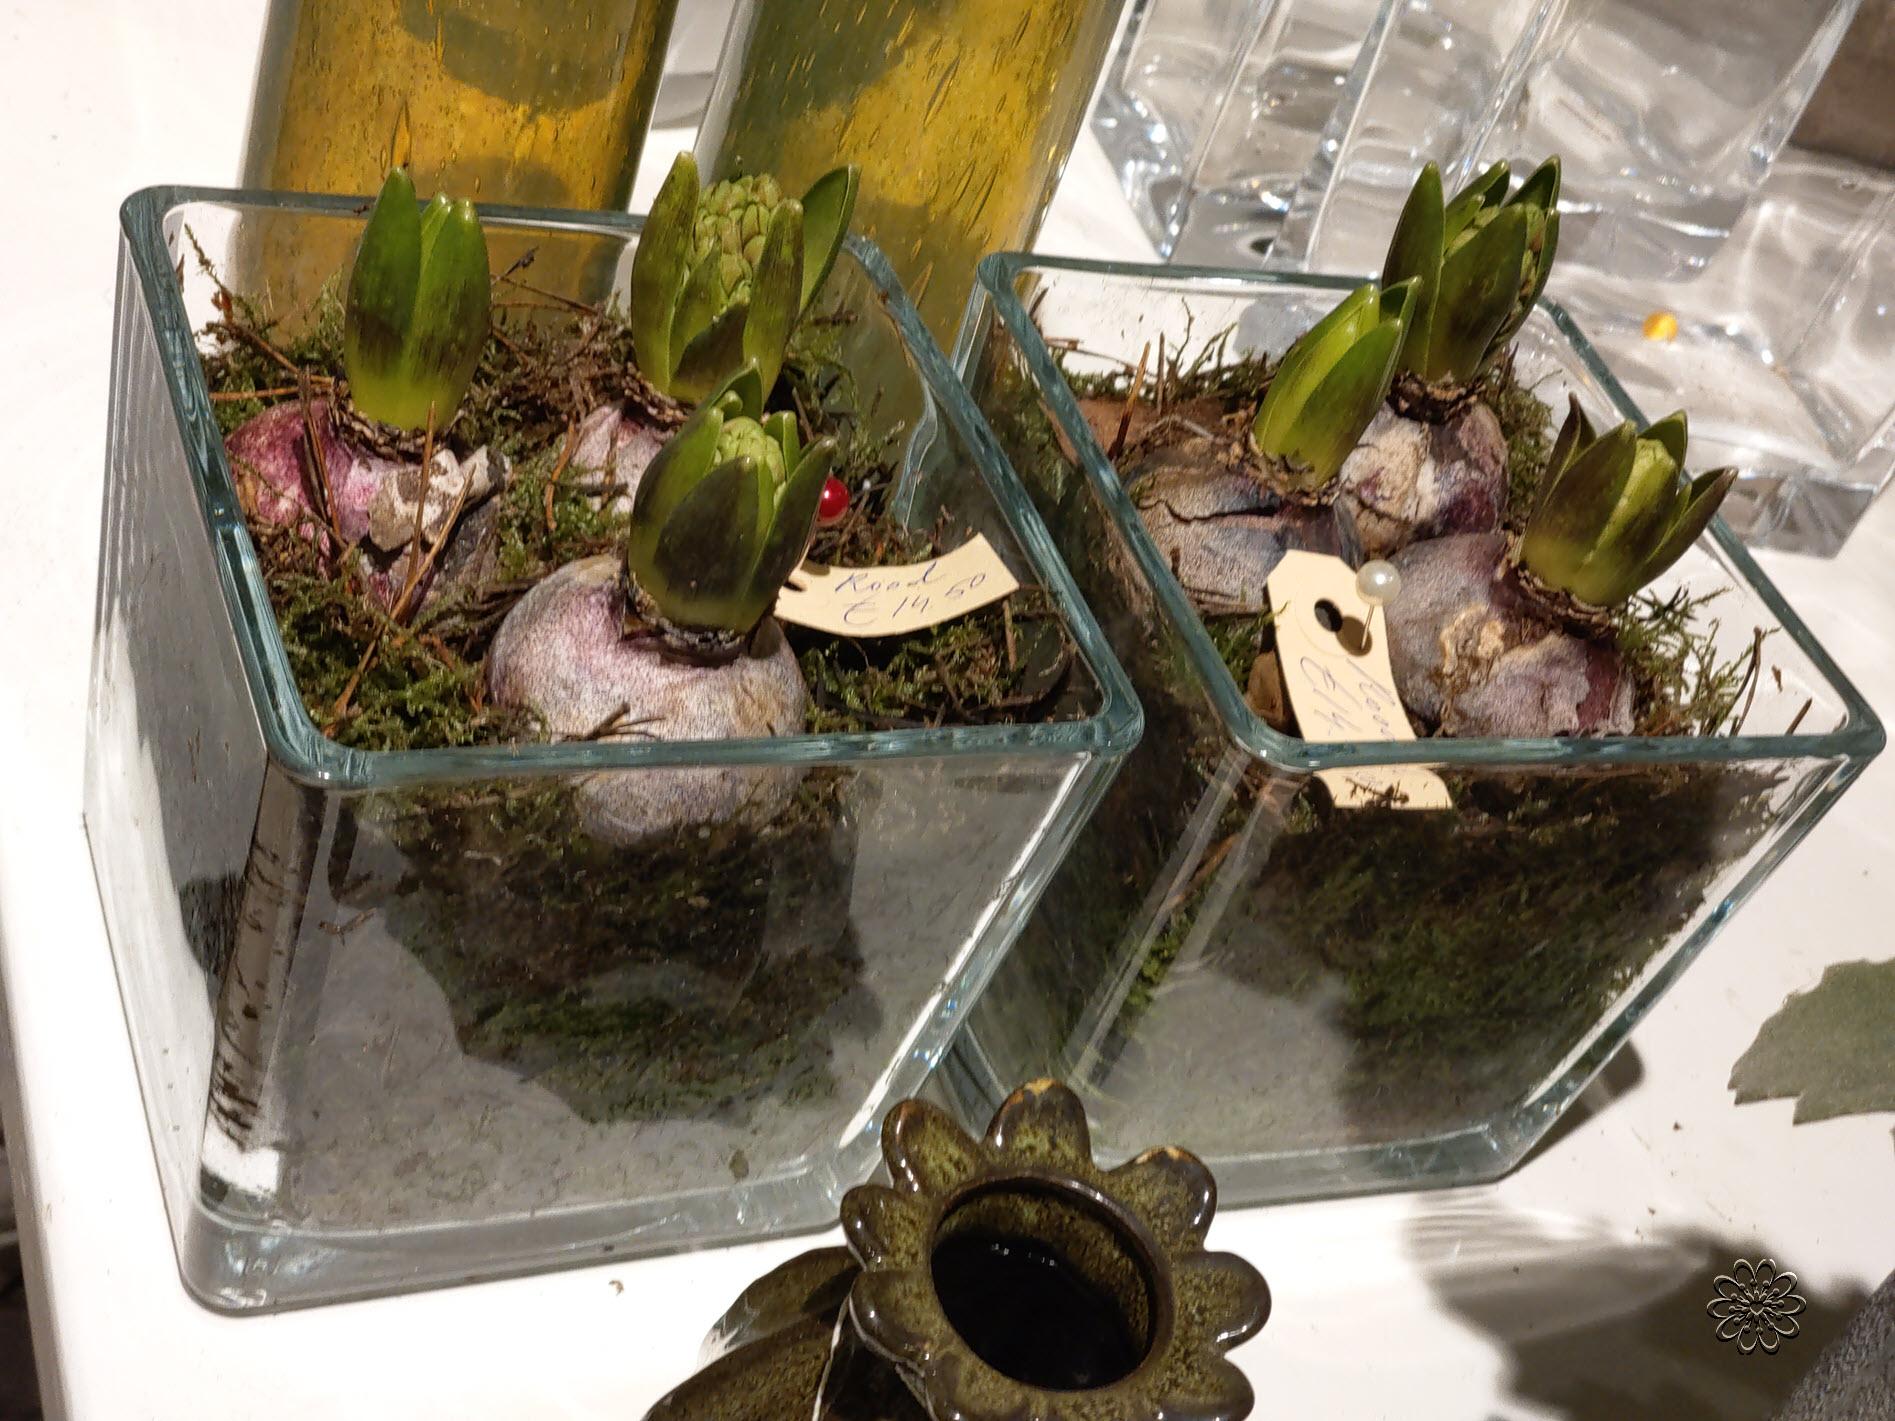 Bloemsierkunst-Groeneveld-kamerplanten-bollen-14